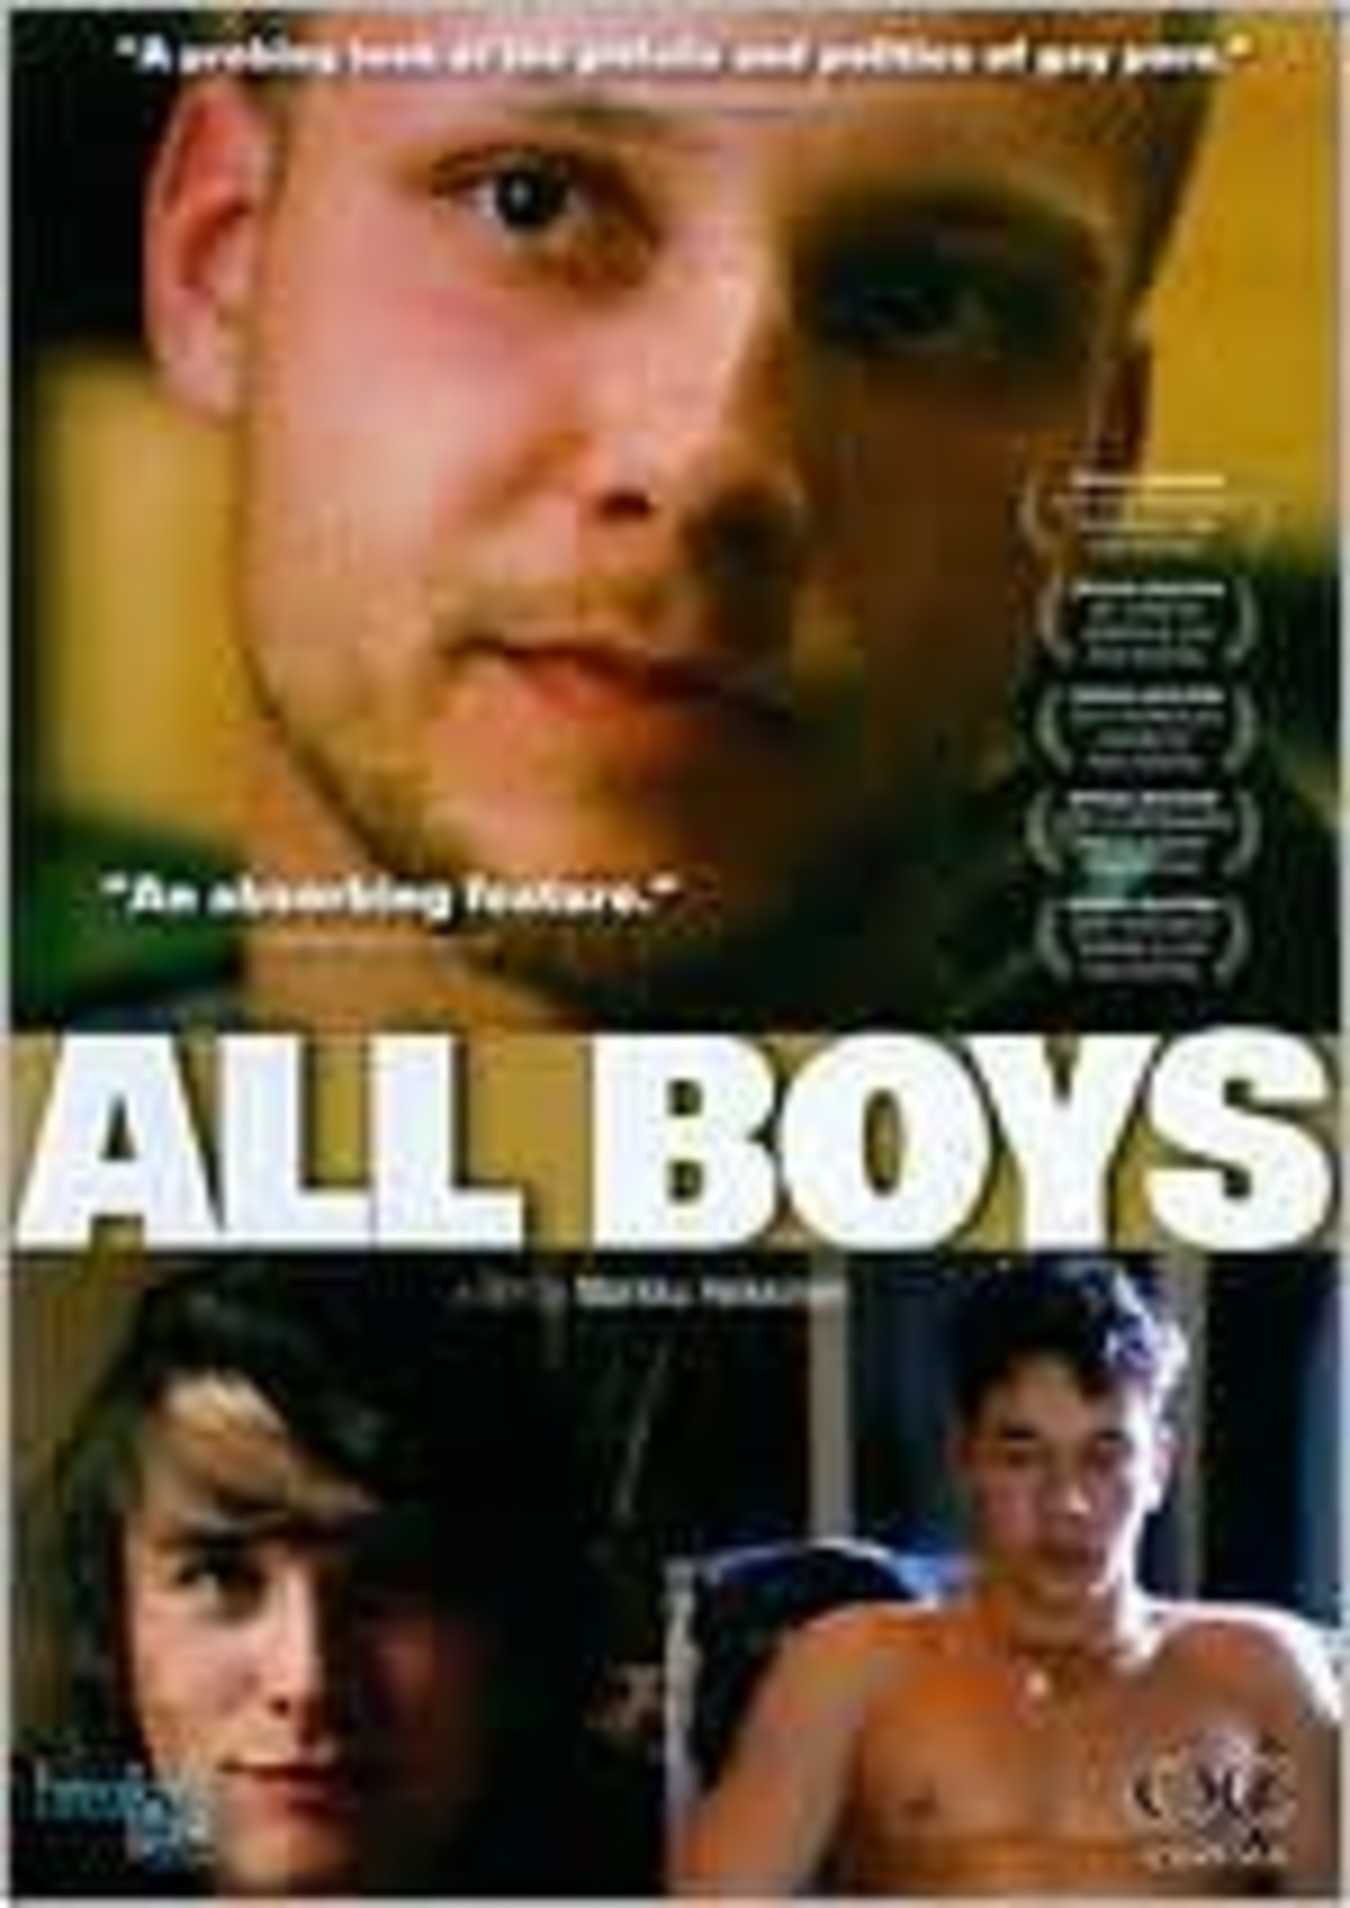 All image boys pornos clip